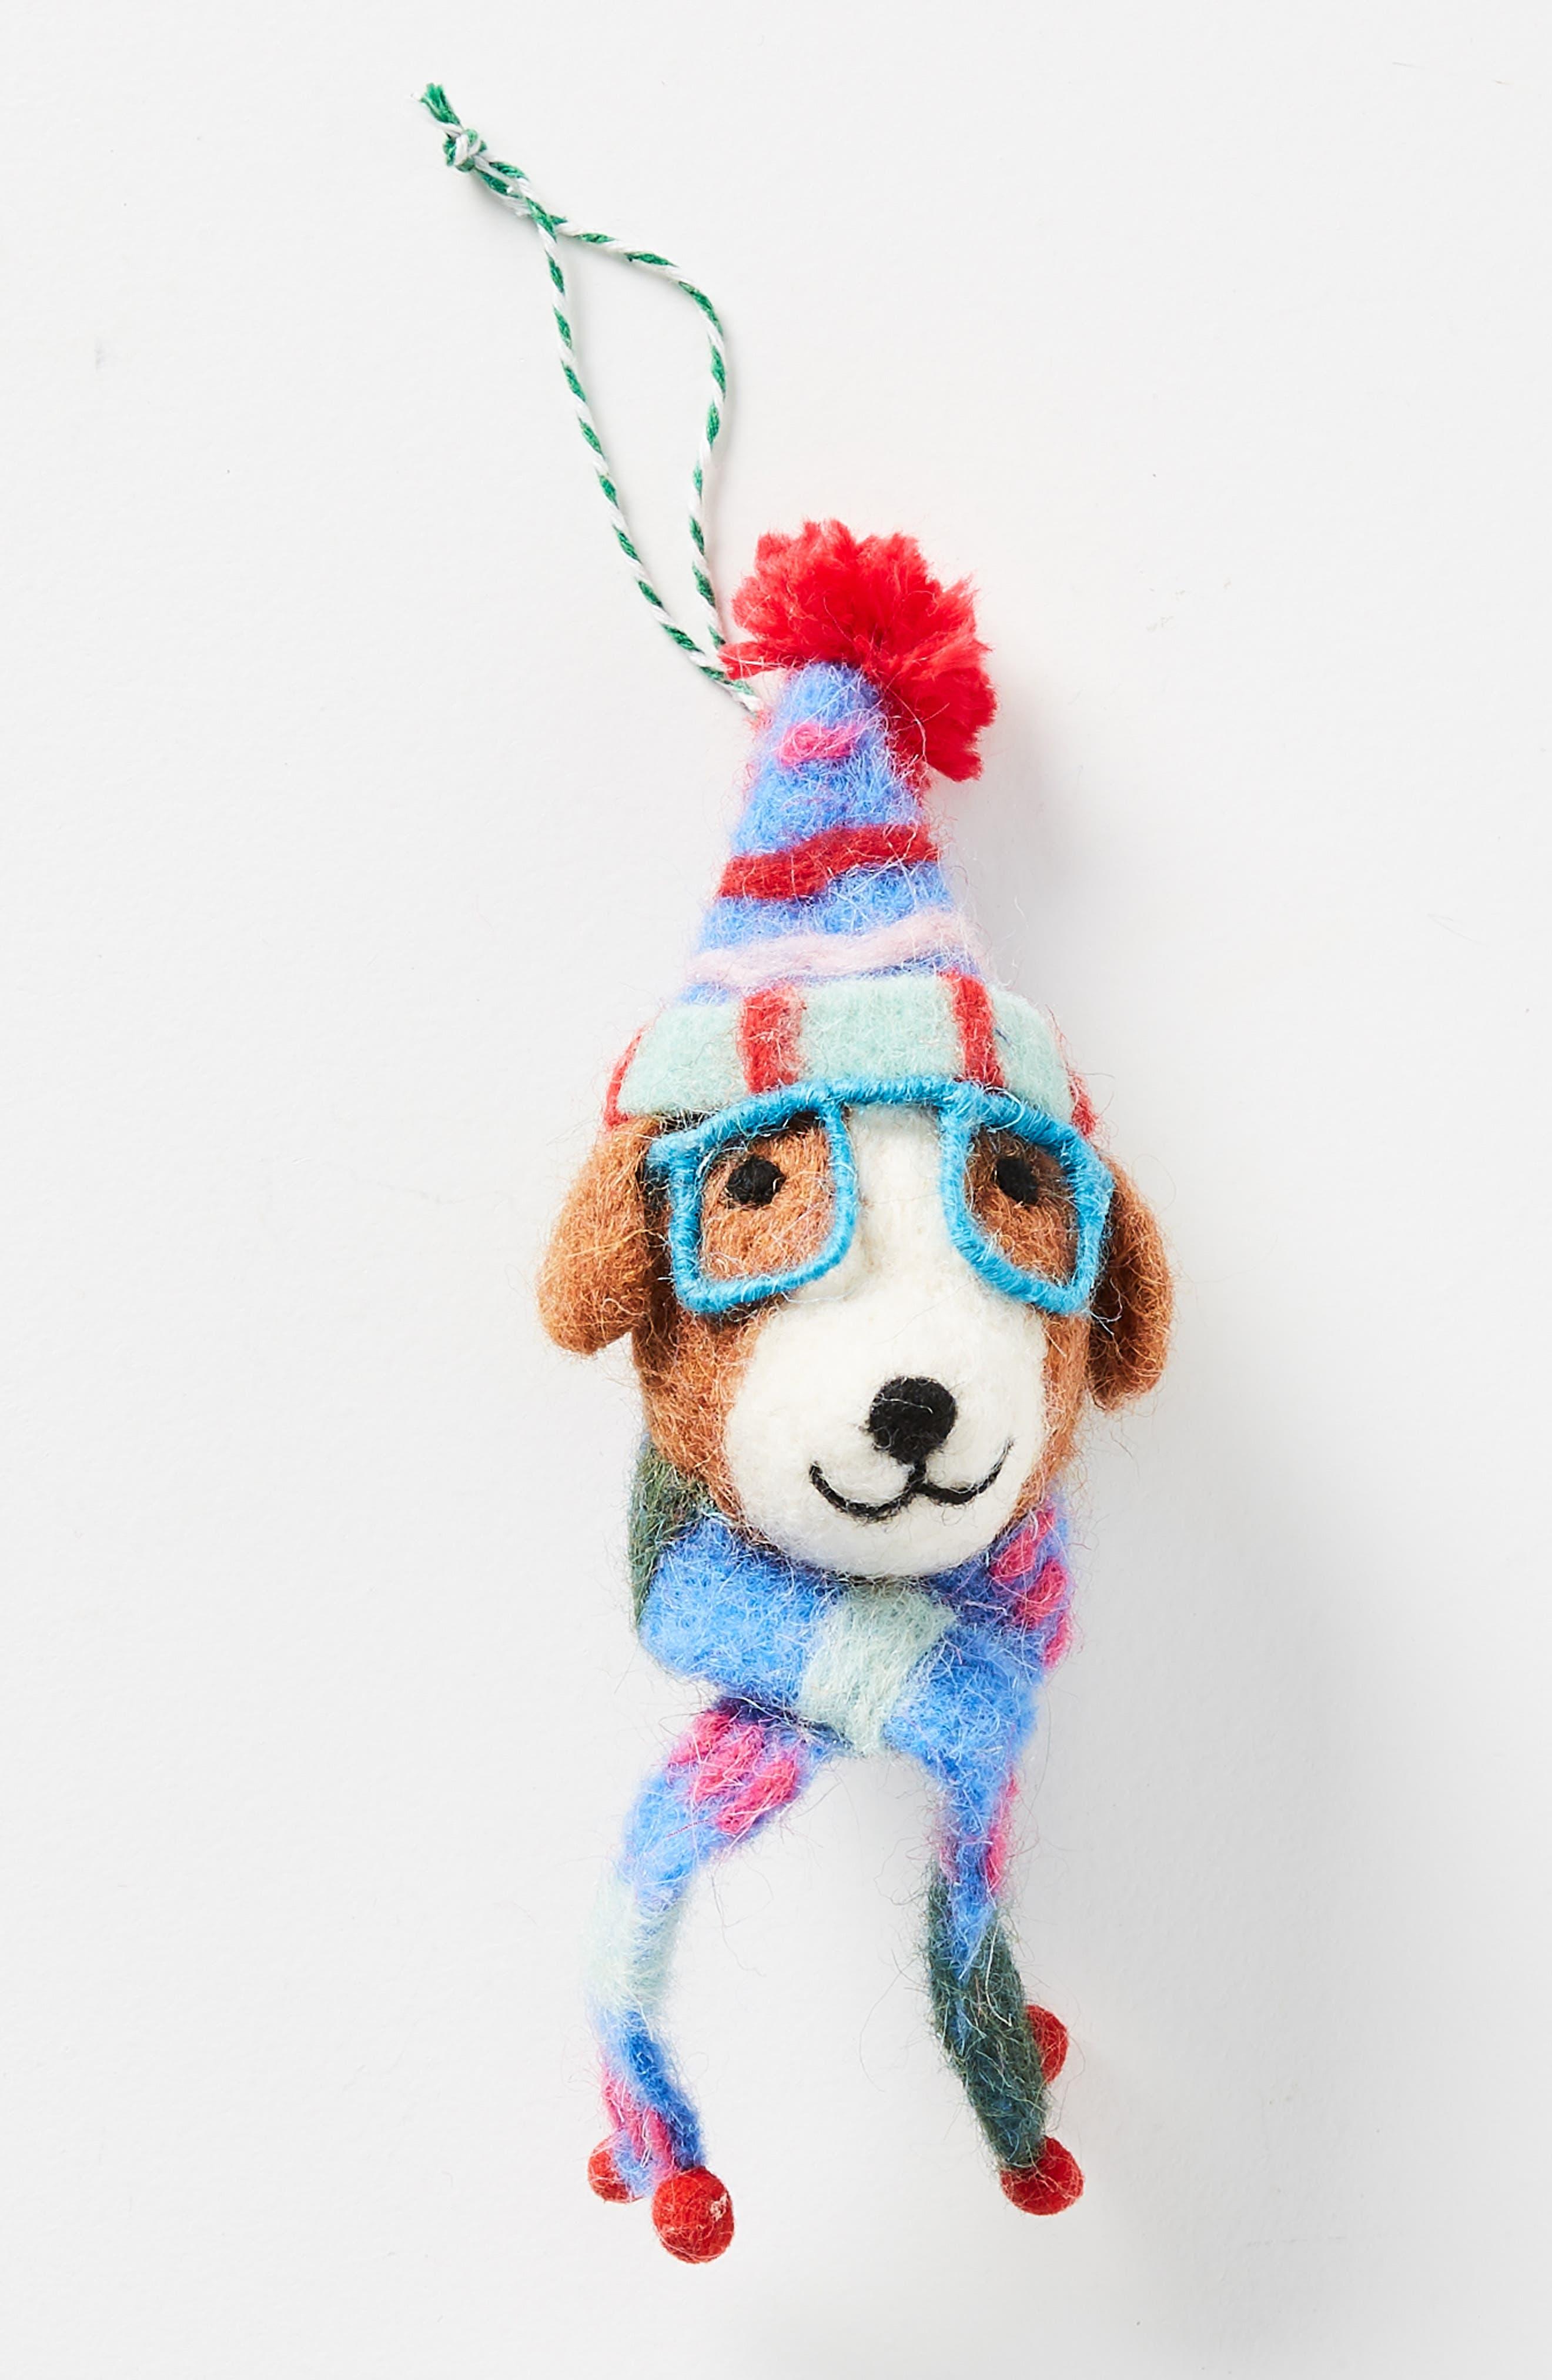 ANTHROPOLOGIE,                             Decked Out Dog Felt Ornament,                             Alternate thumbnail 2, color,                             200